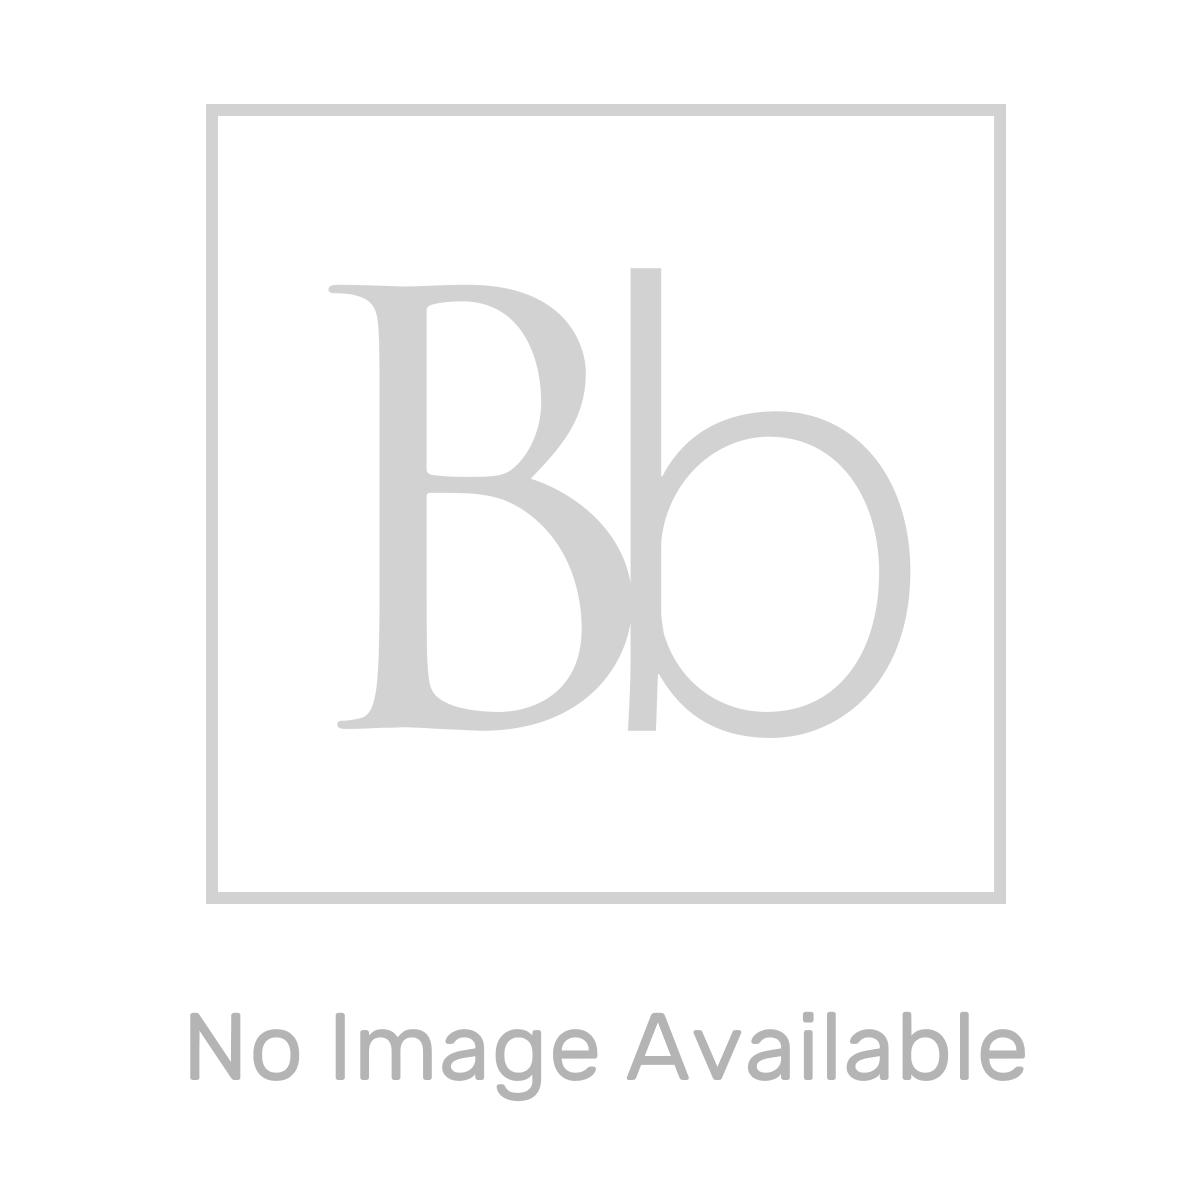 HiB Qubic 80 LED Double Door Cabinet